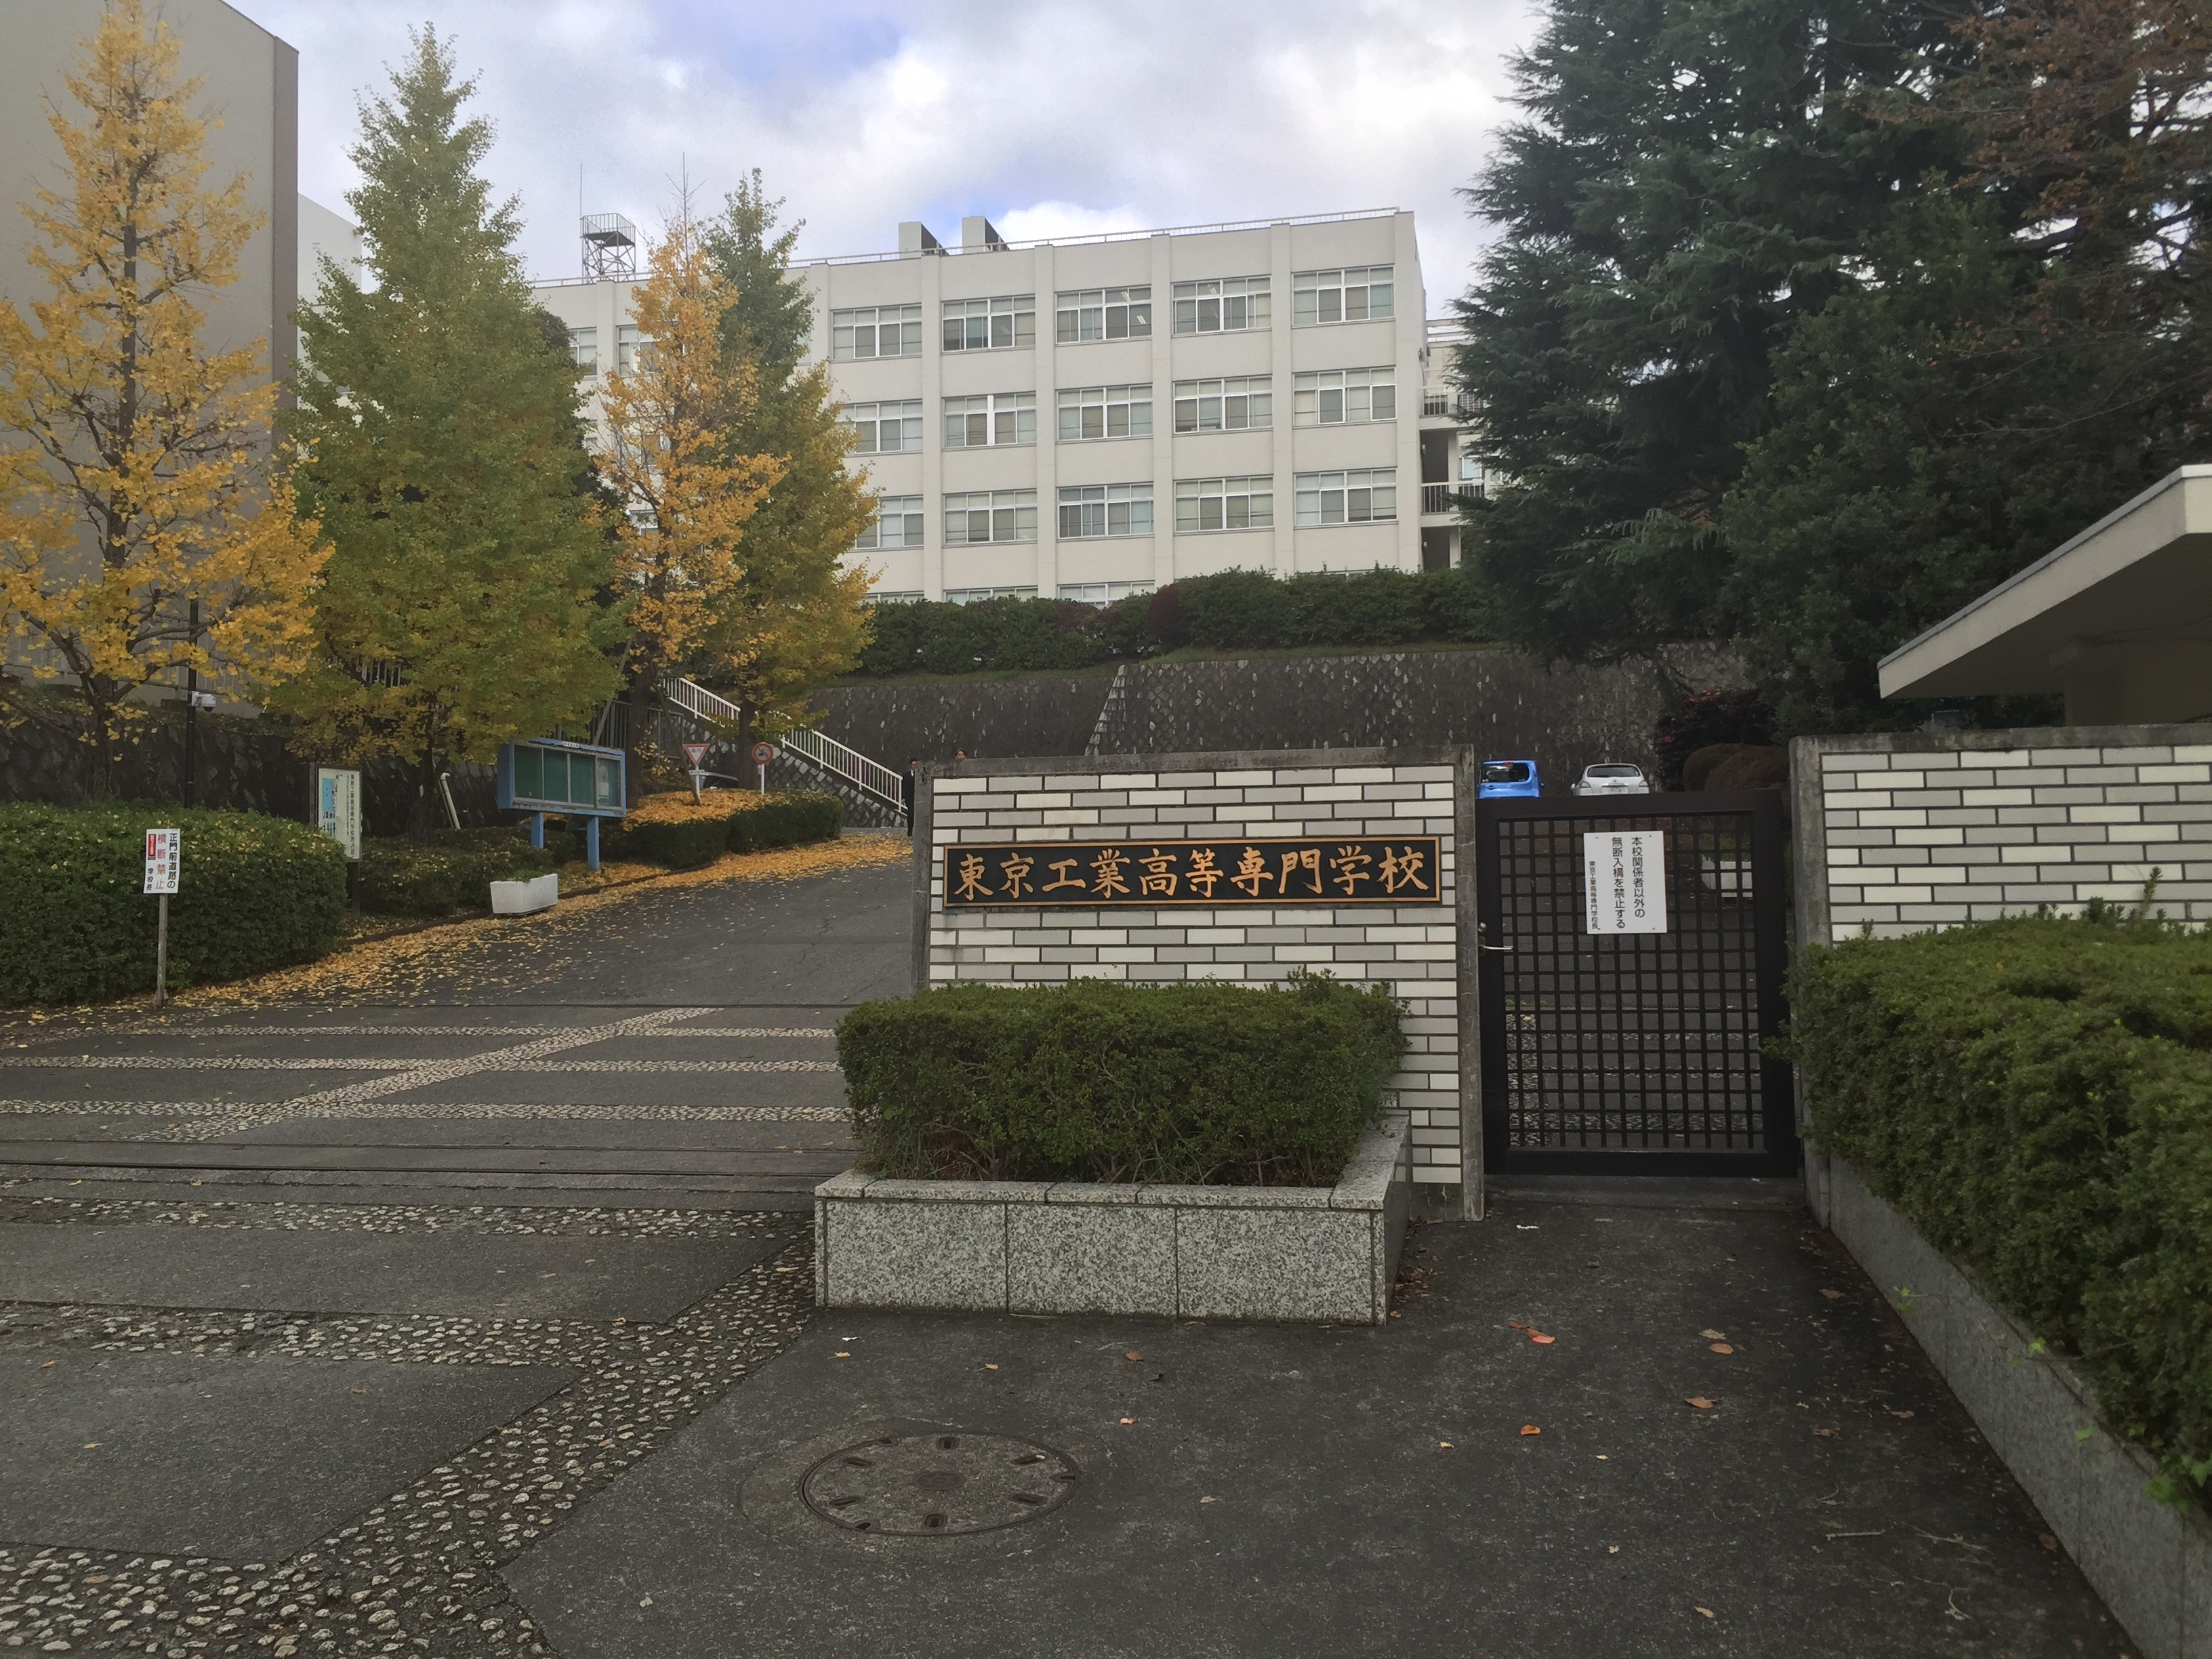 特別客員教授としてデビュー (独立行政法人 国立高等専門学校機構 東京工業高等専門学校)